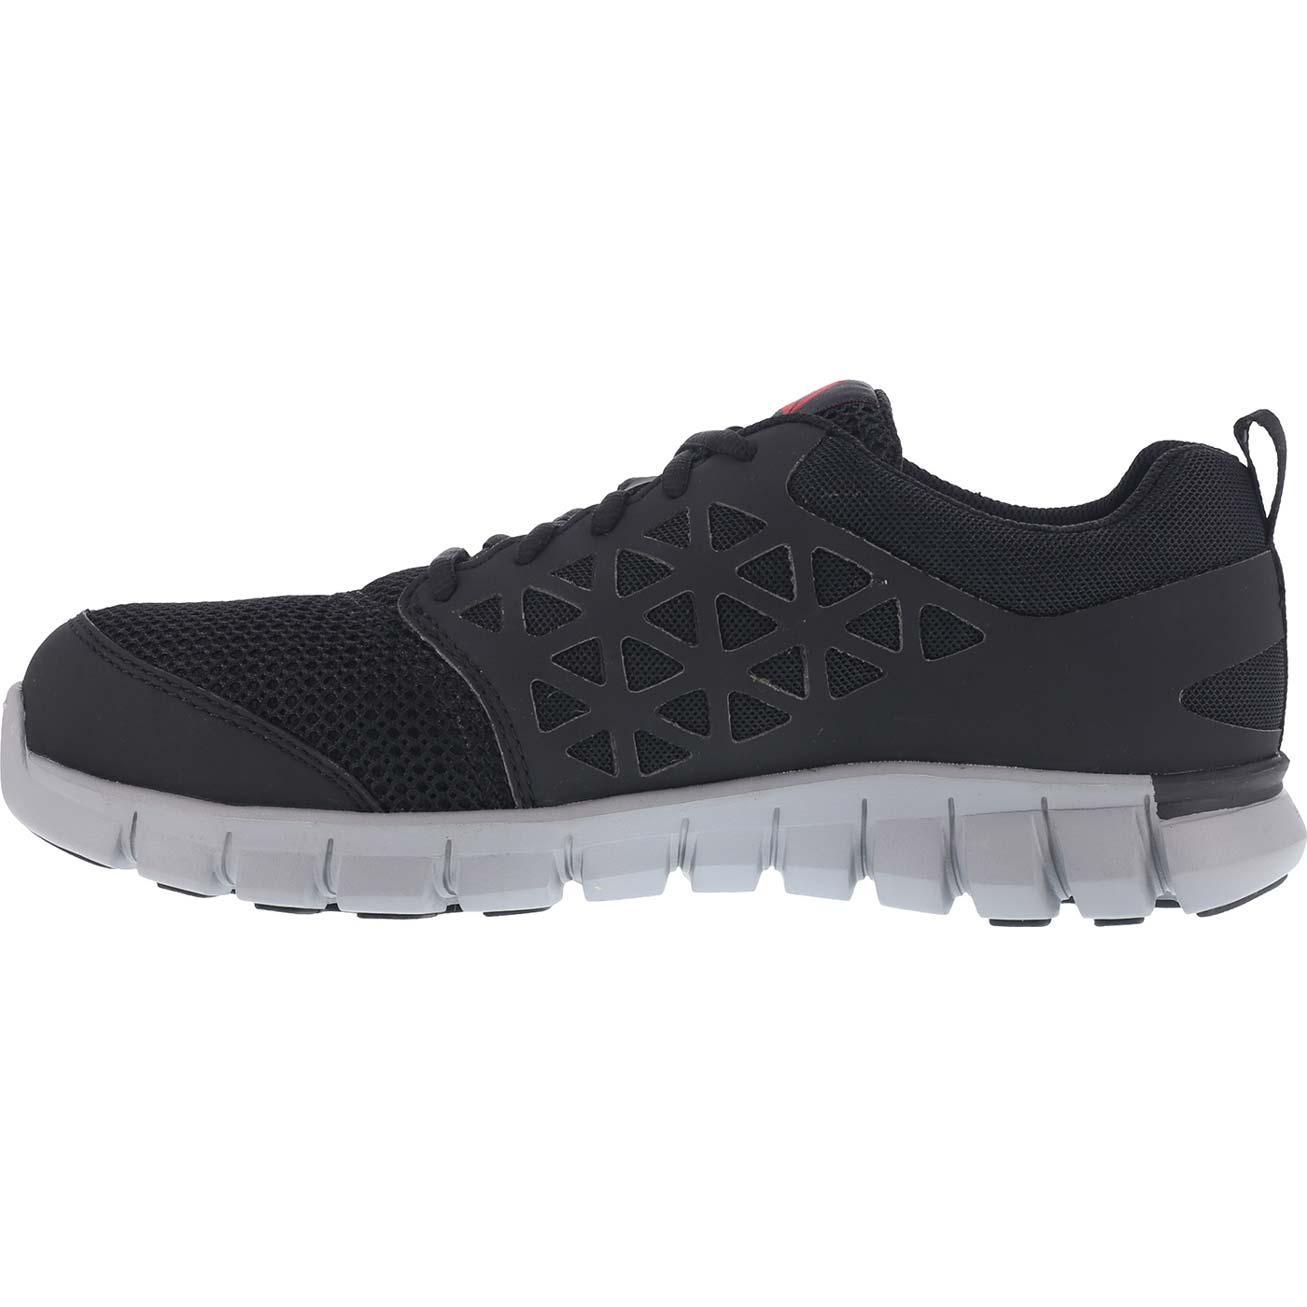 f9fd04ea449b1c Reebok Sublite Cushion Work Women s Alloy Toe Work Athletic Shoe